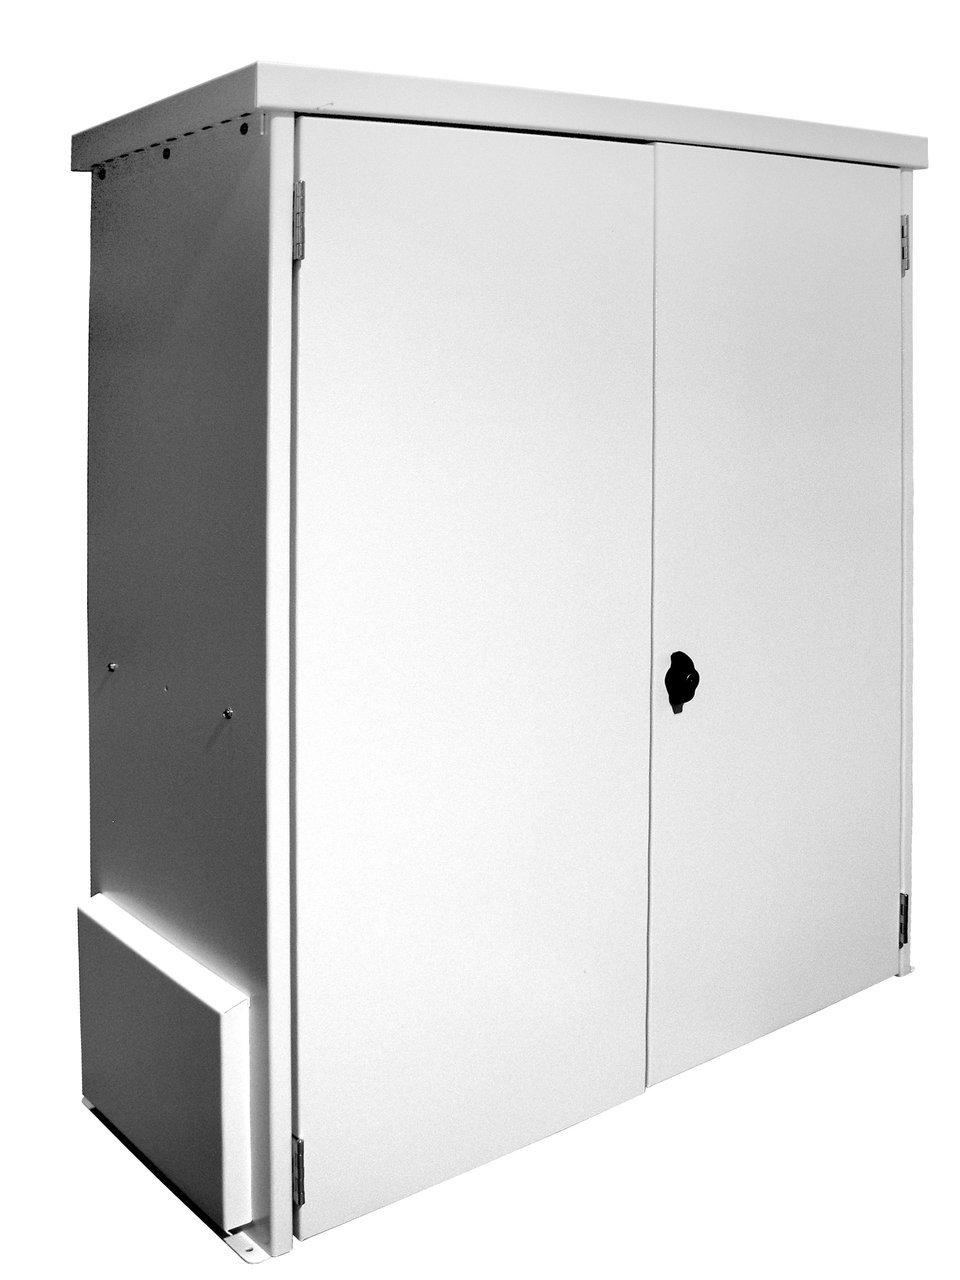 MNBE-D3R MidNite Solar Battery Enclosure